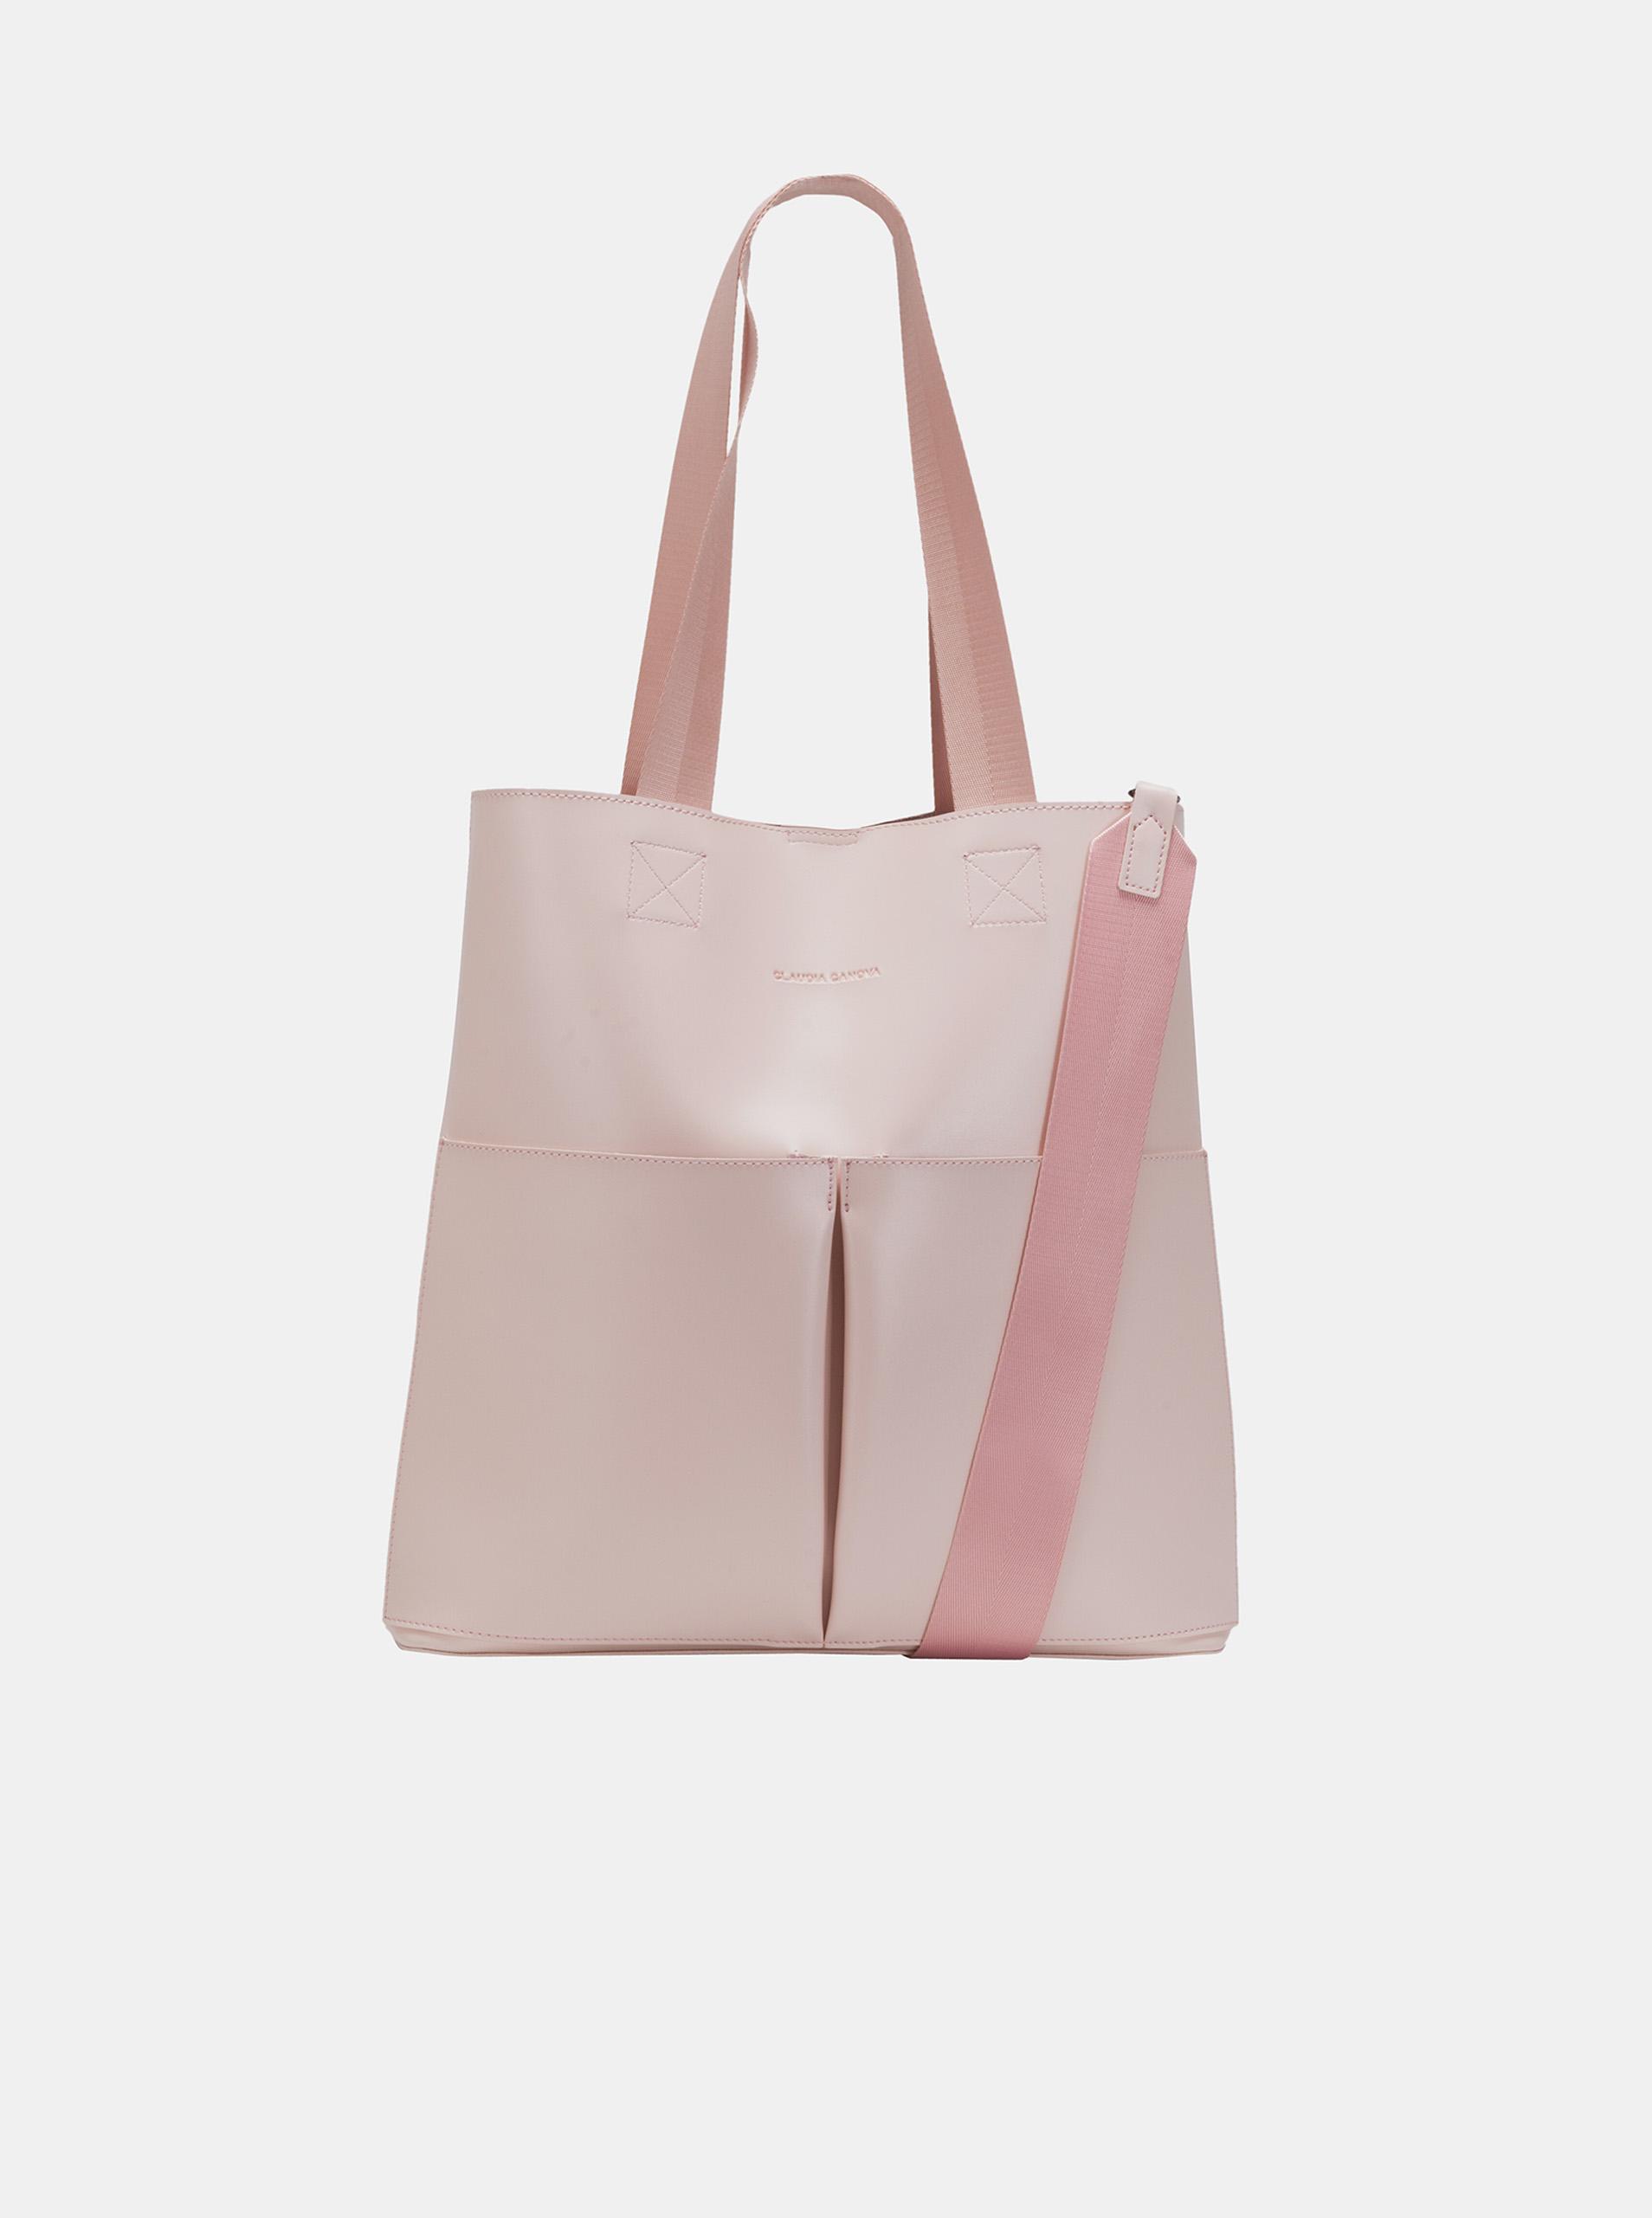 Claudia Canova roza torbica